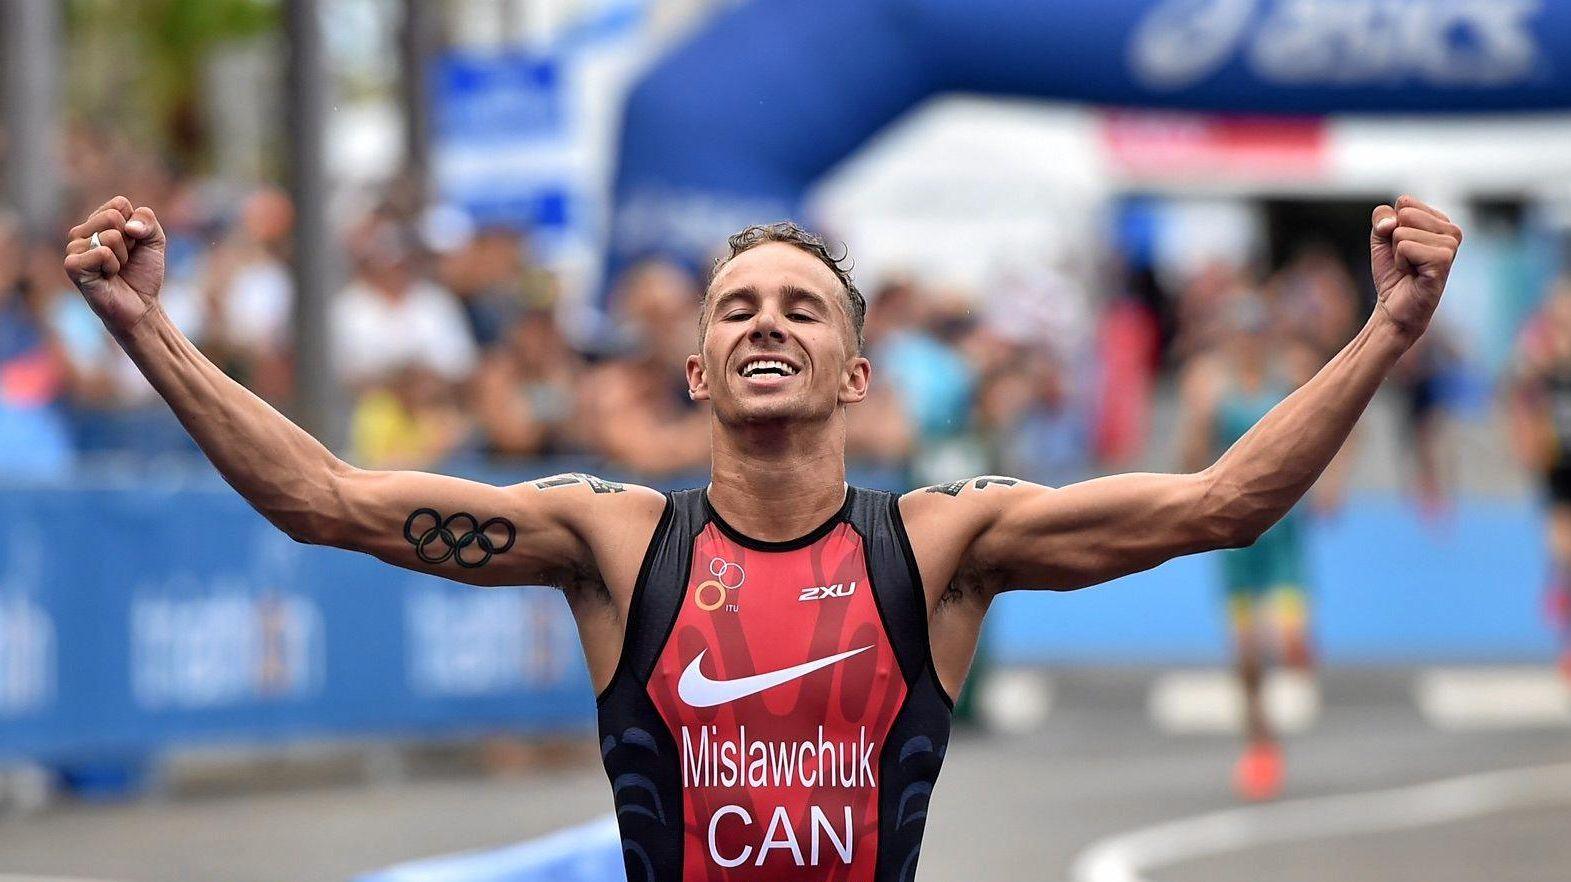 Canadian Tyler Mislawchuk won the men's Mooloolaba ITU World Cup  on Saturday, March 16